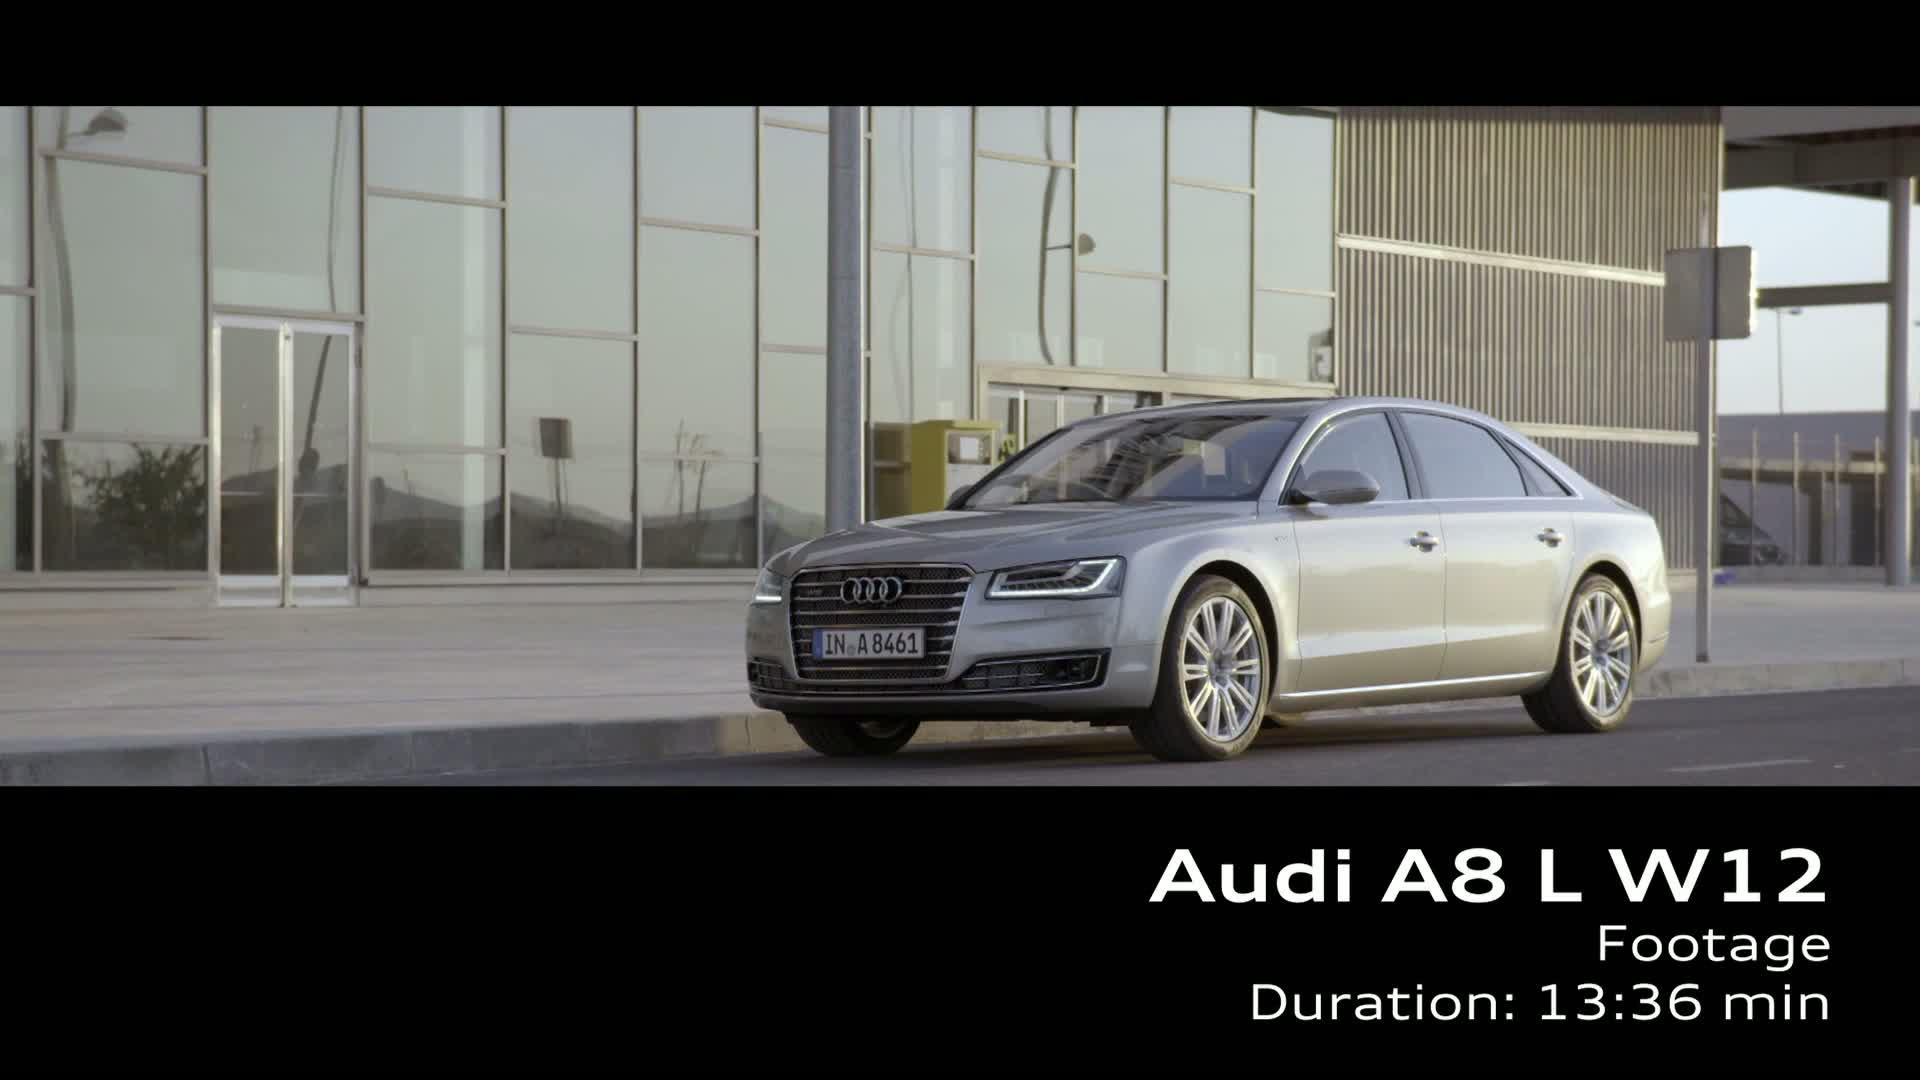 Der Audi A8 L W12 - Footage